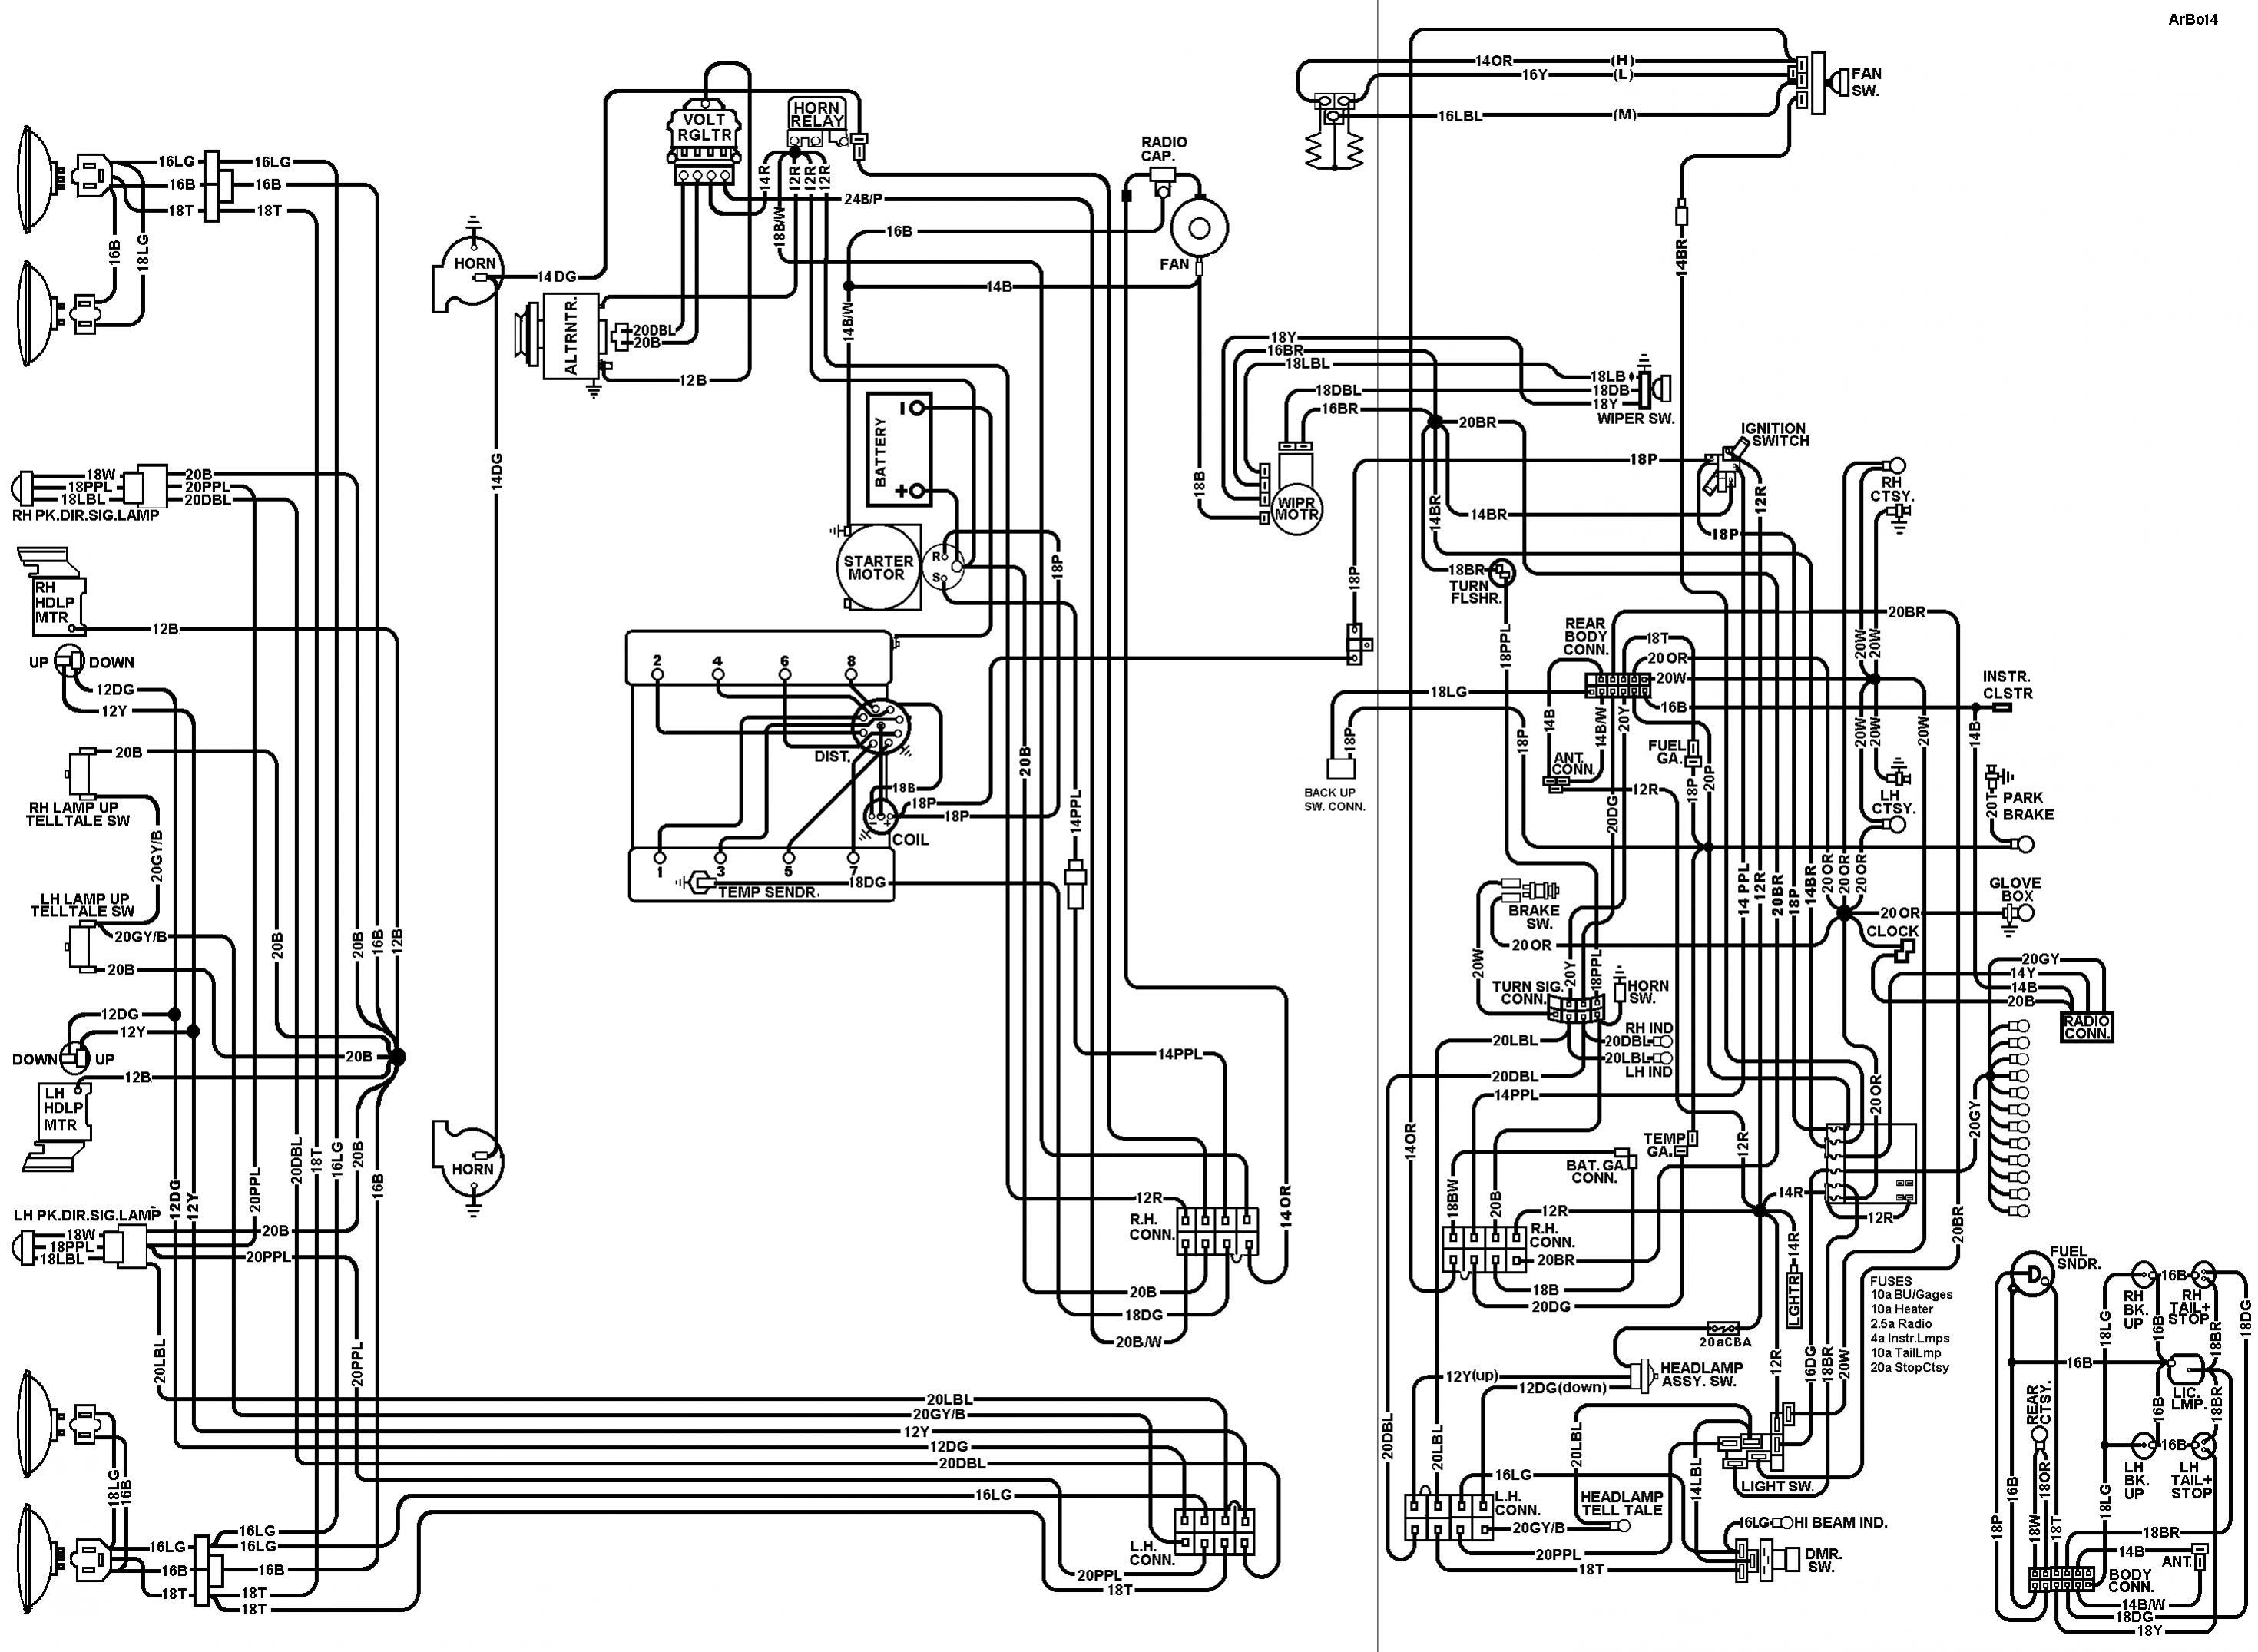 Fantastic Teleflex Tachometer Wiring Diagram Ideas - Electrical ...